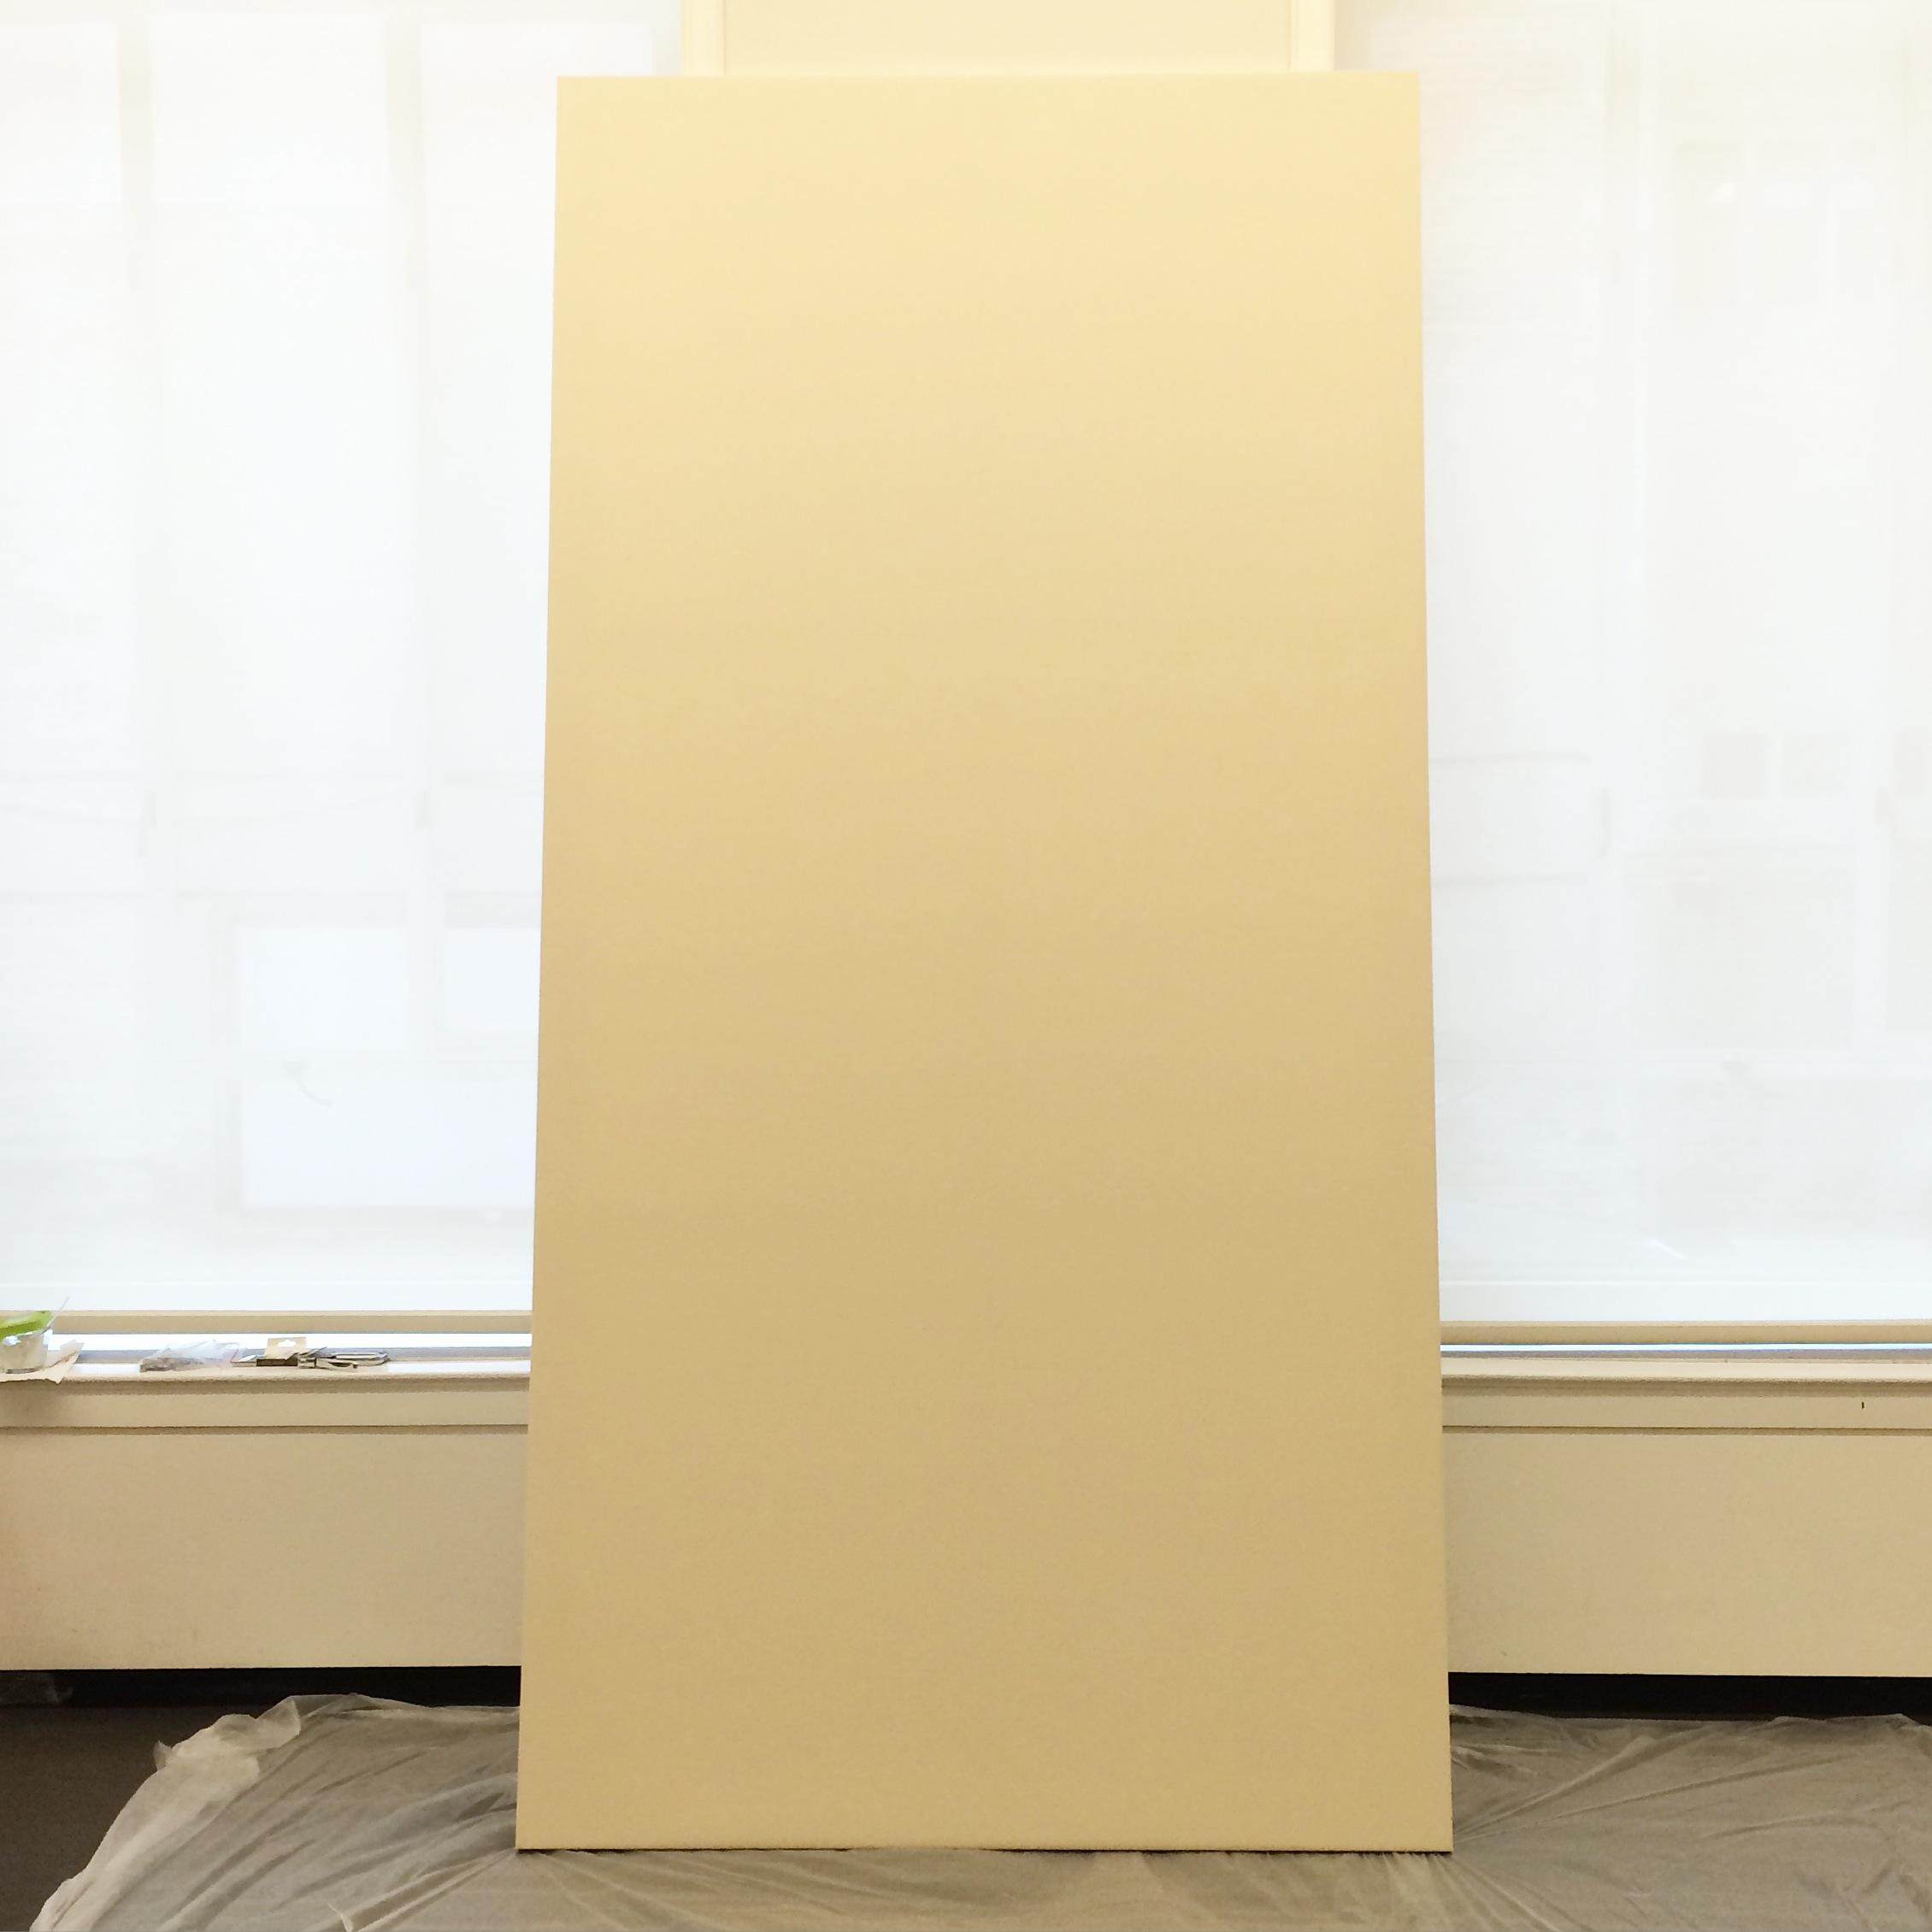 10 x 5 ft blank canvas ready to go